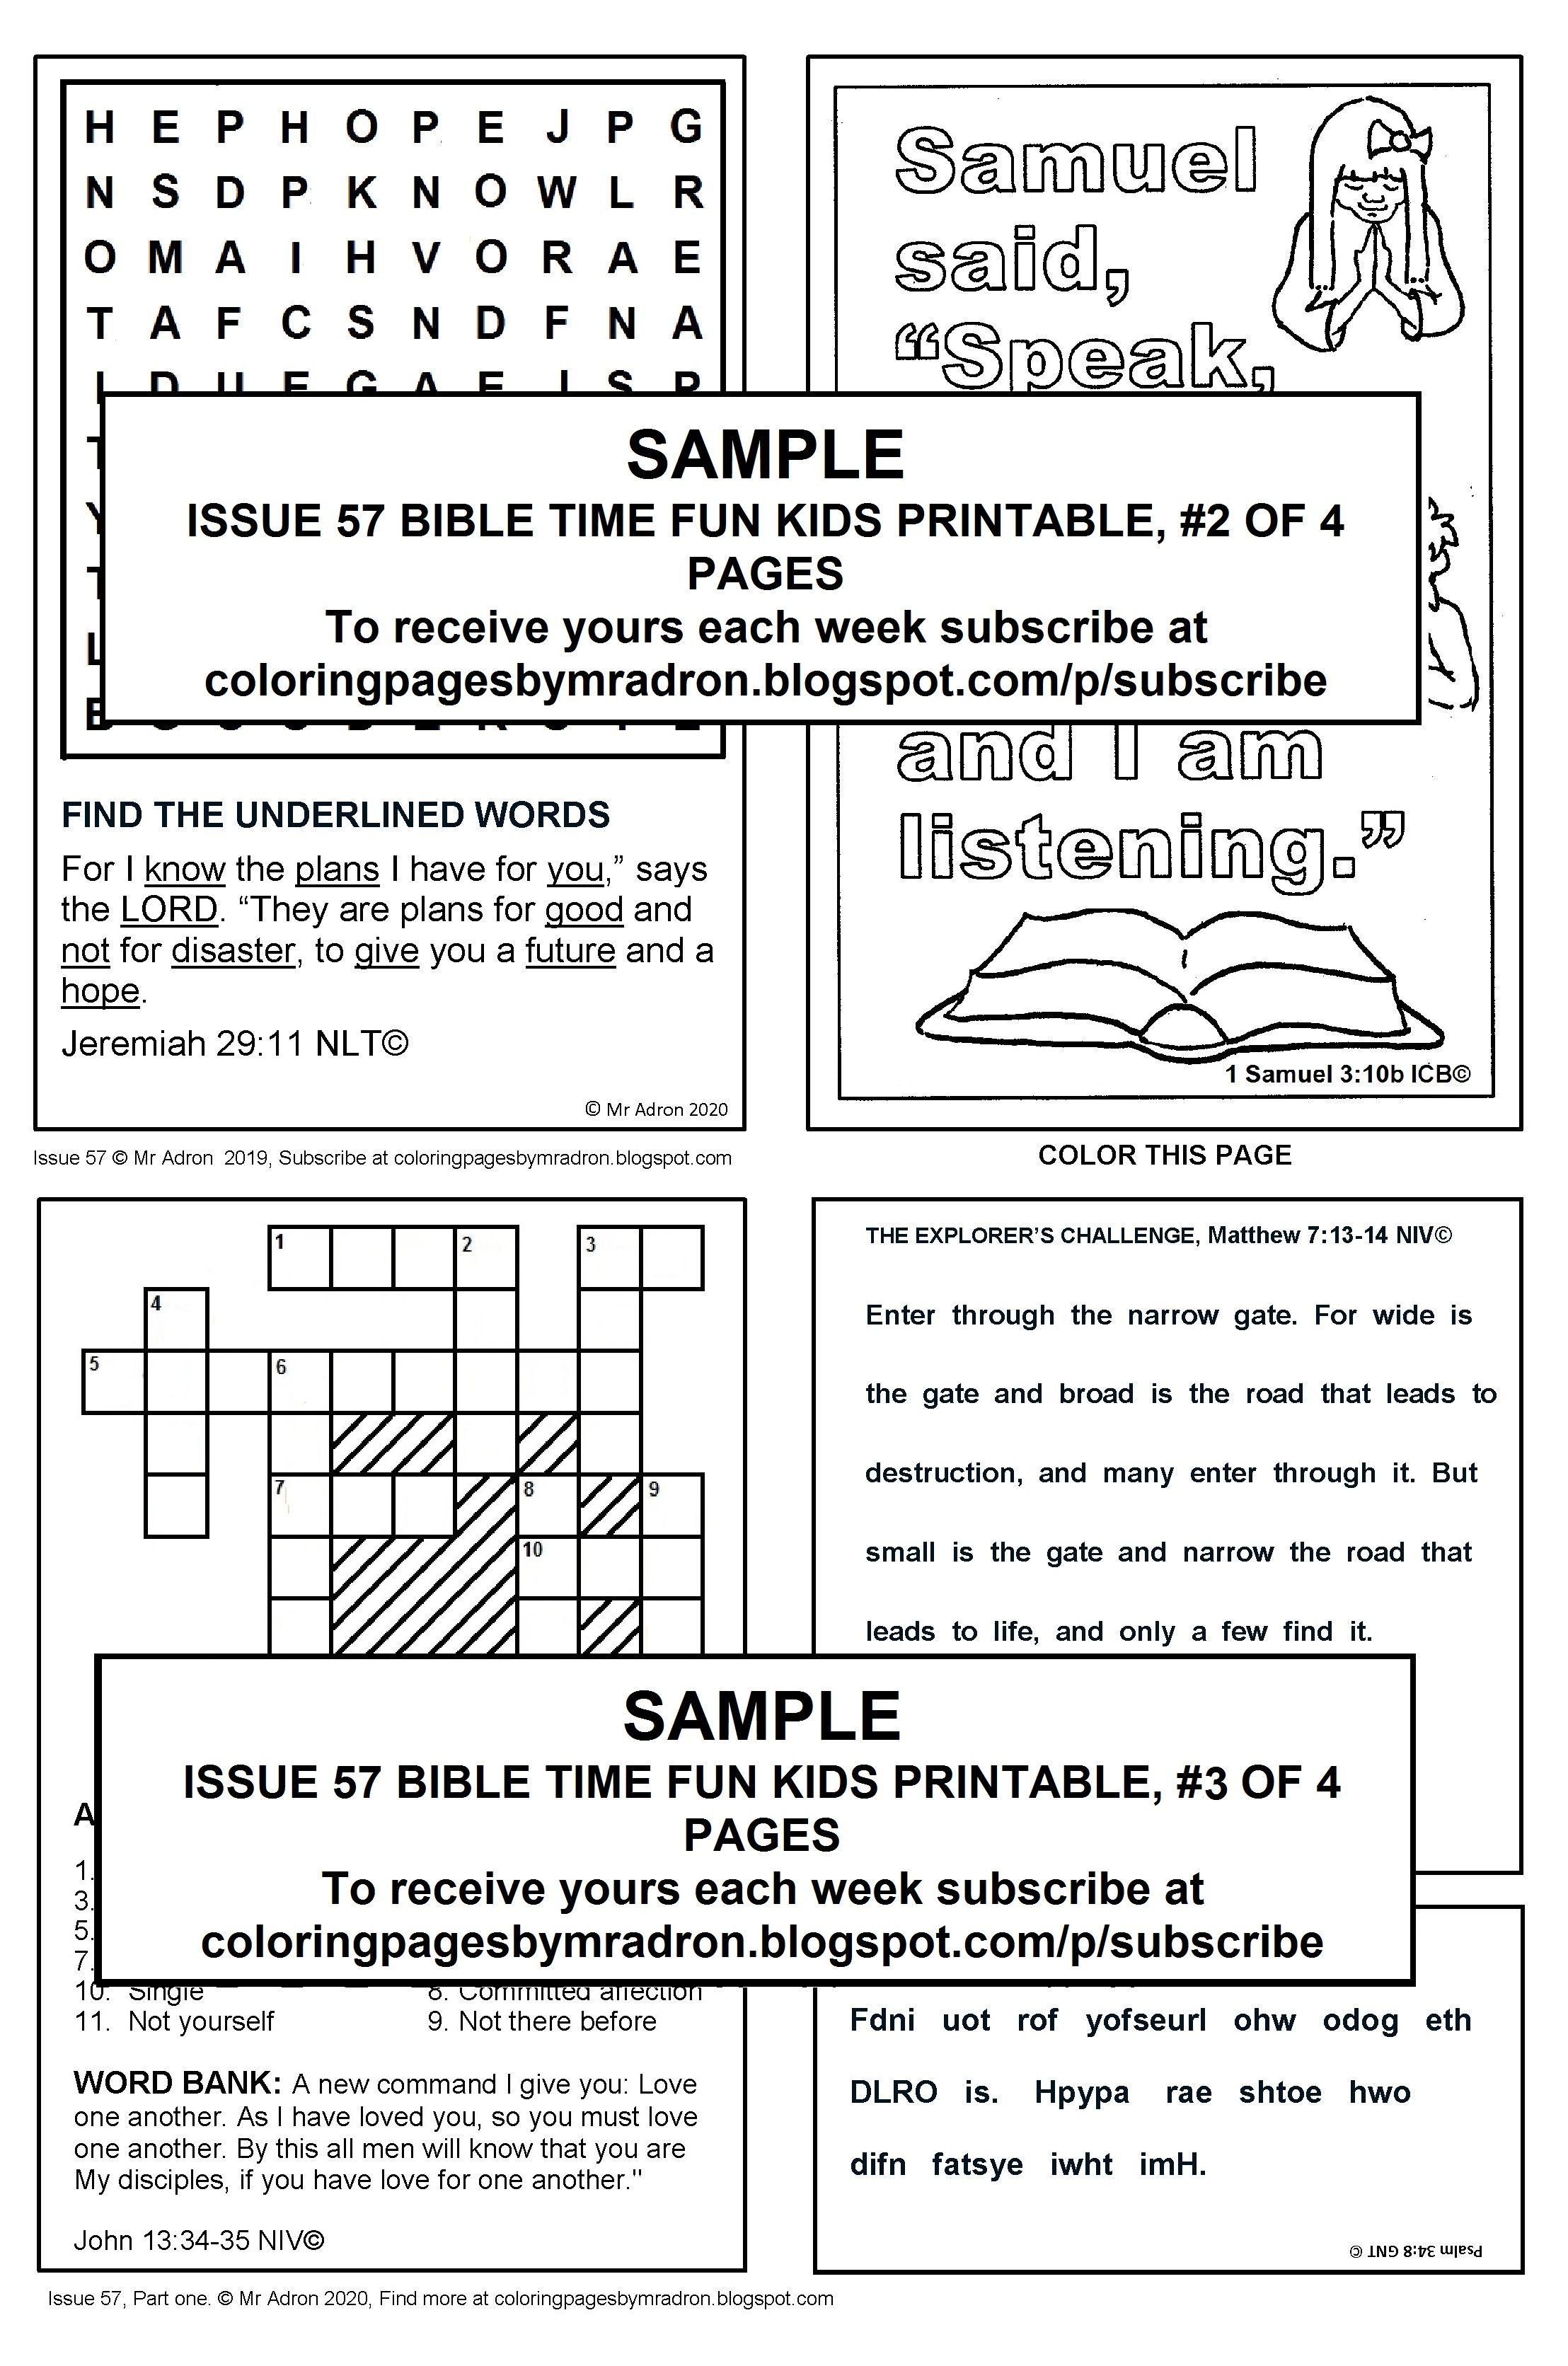 Pin On Bible Fun Activity Printables For Kids Children bible activities worksheets